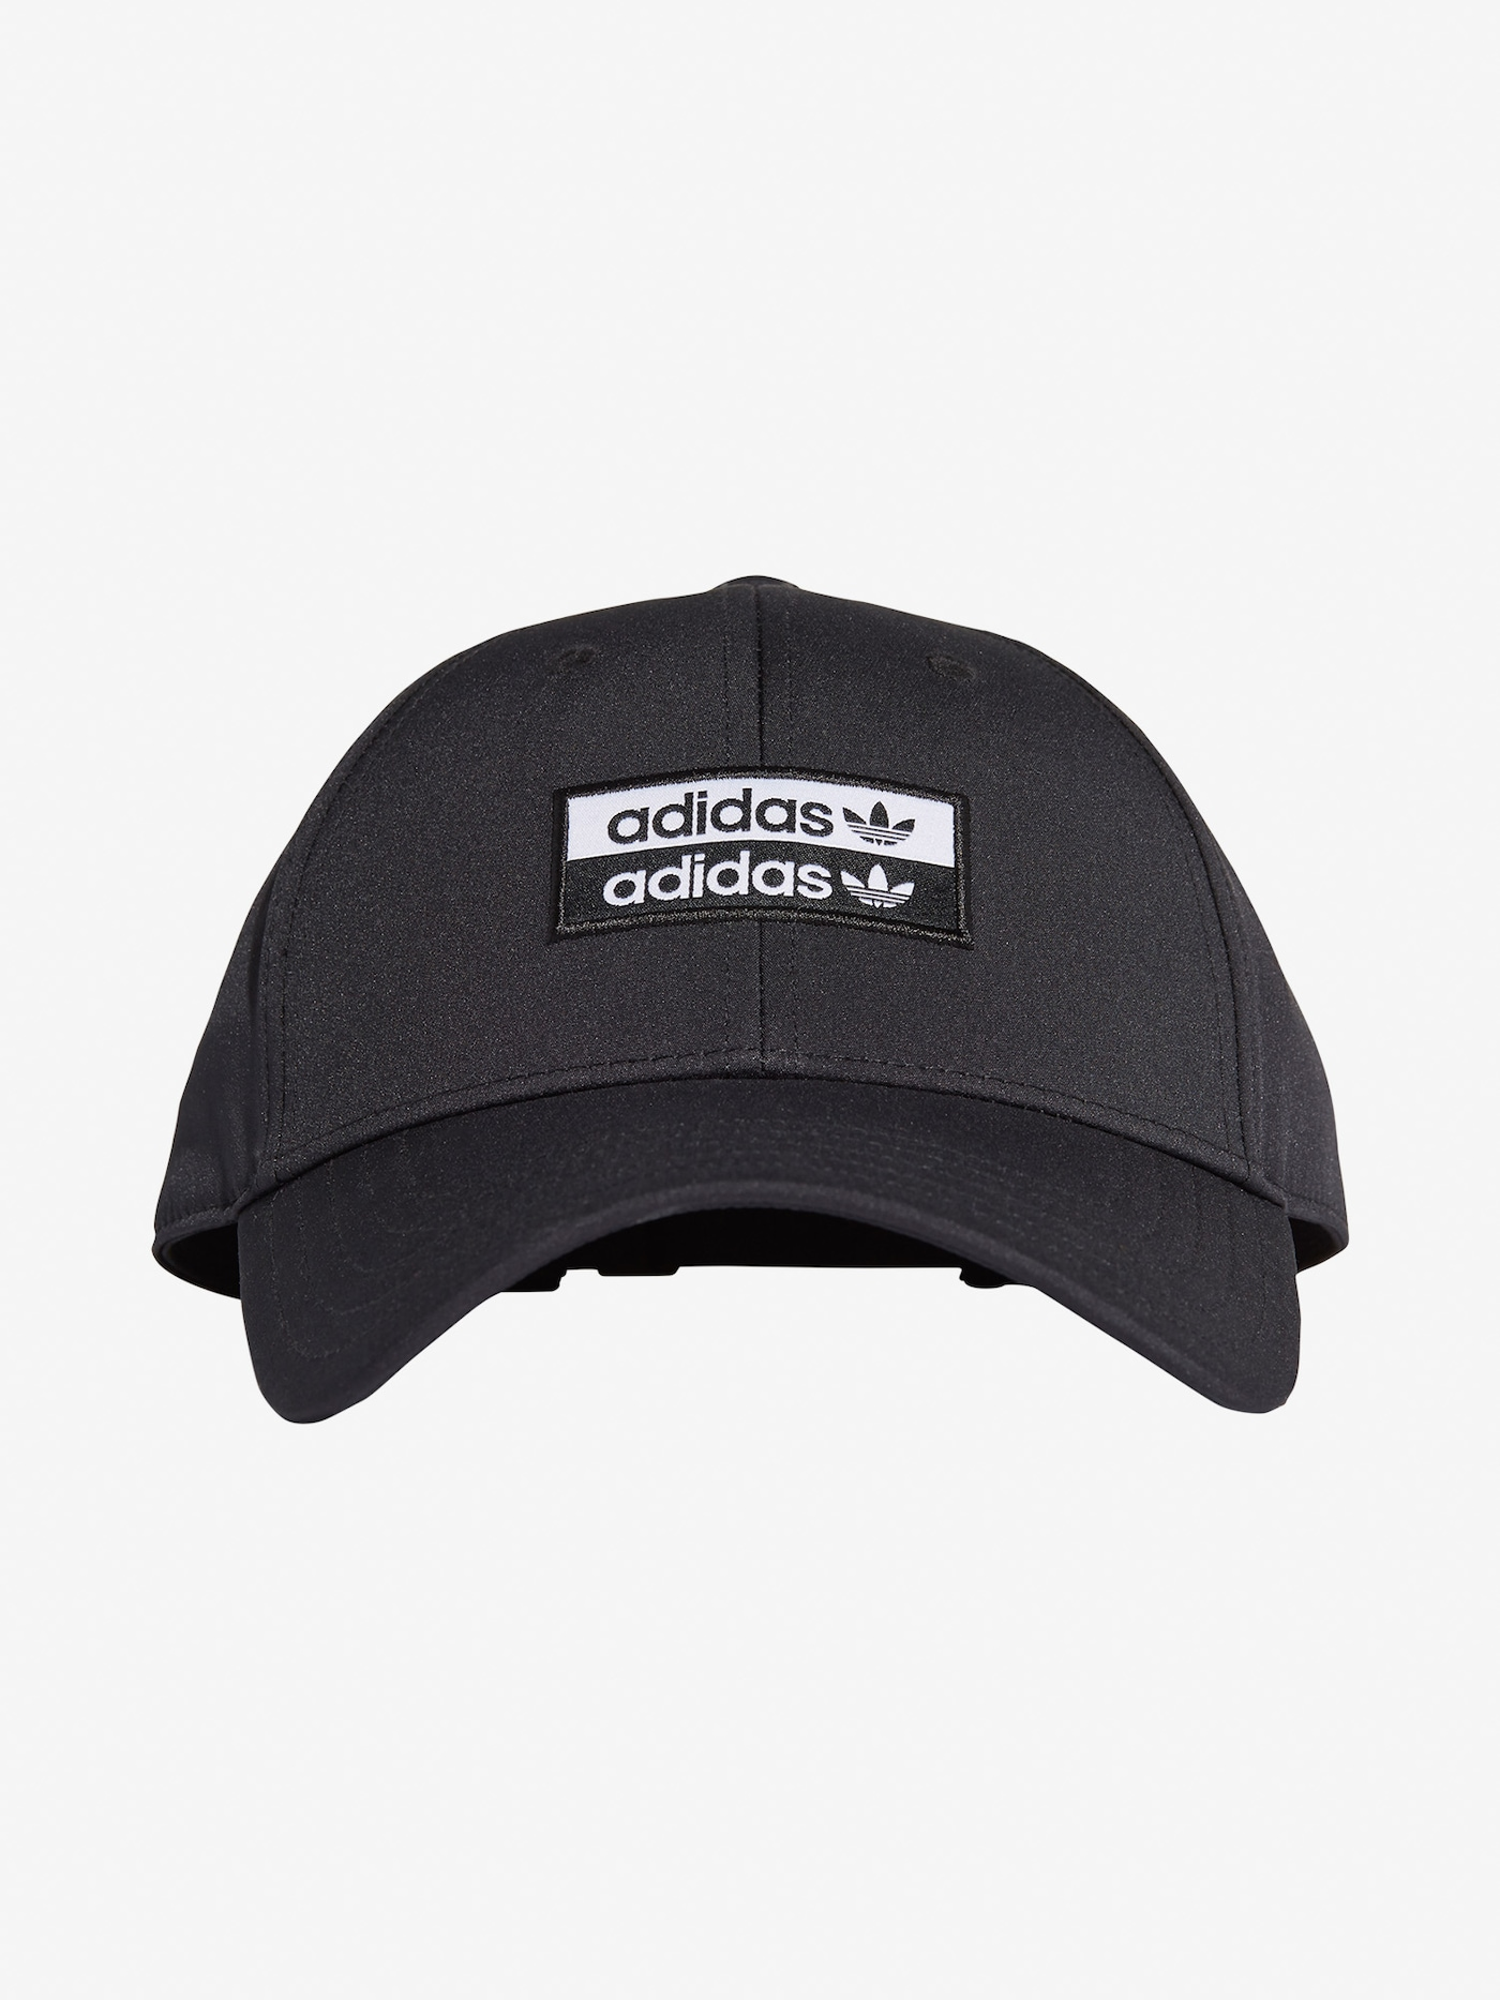 Adidas Originals Bball Cap